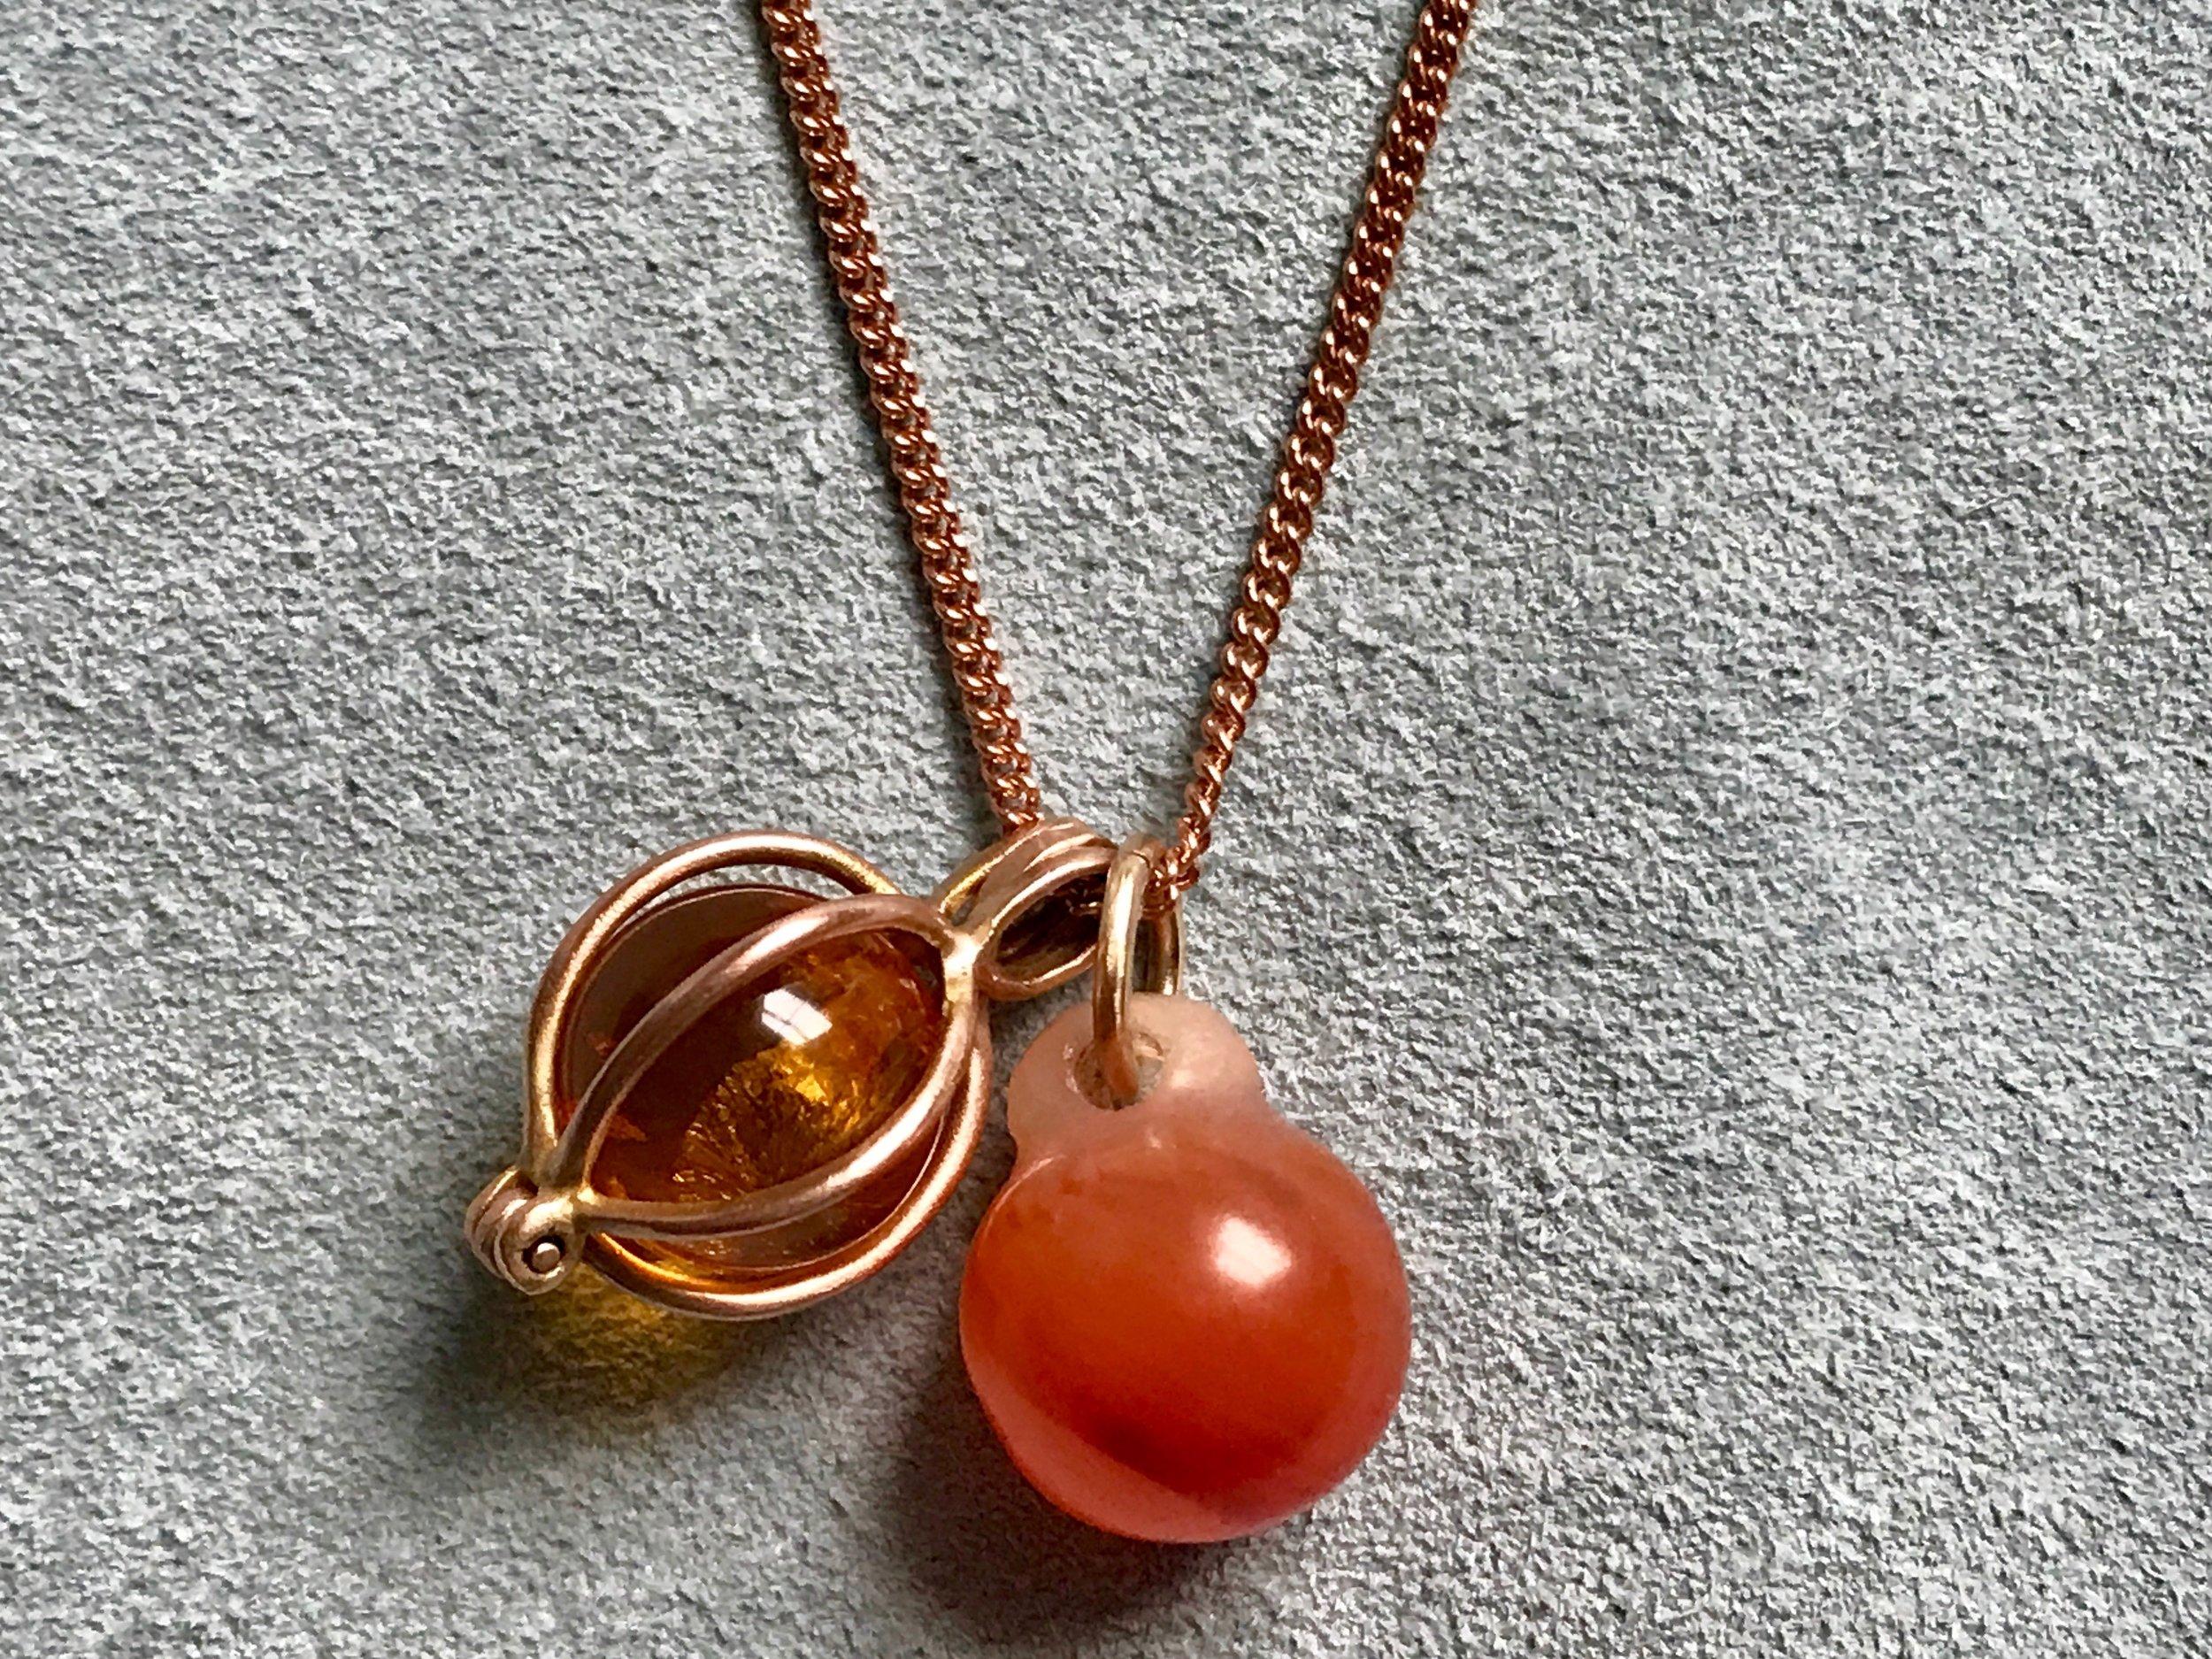 Carnelian & Amber Curb Chain Necklace by Tara Turner London.jpg